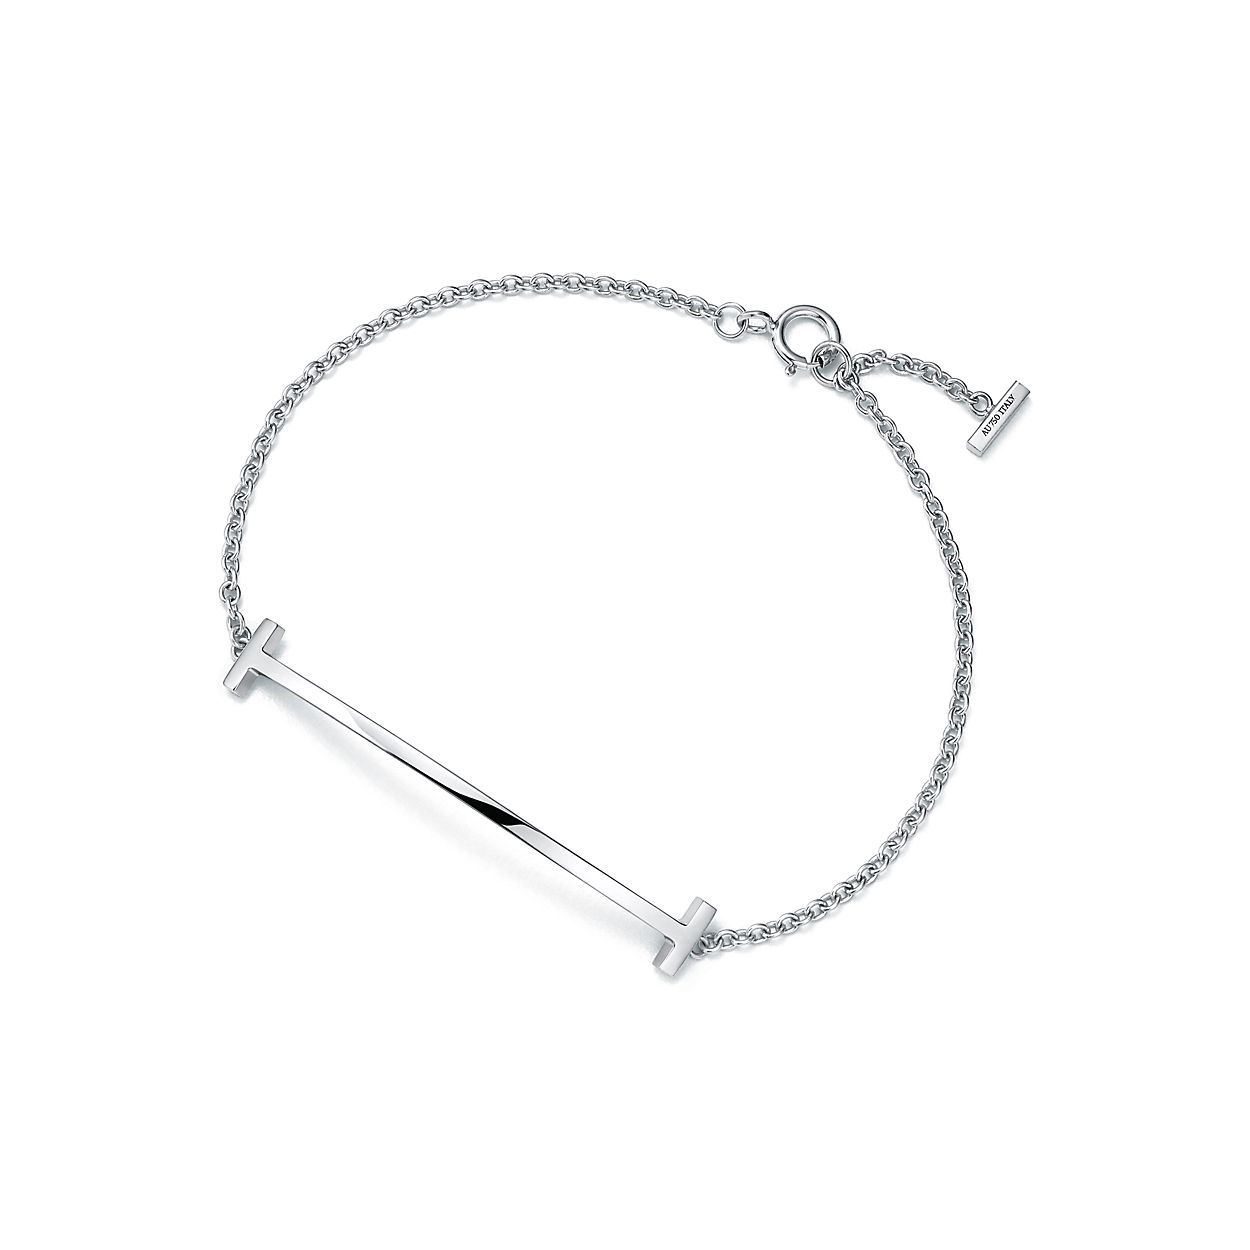 Bracelet Sourire Tiffany T En Or Blanc 18 Carats, Petite - Petite Taille Tiffany & Co.